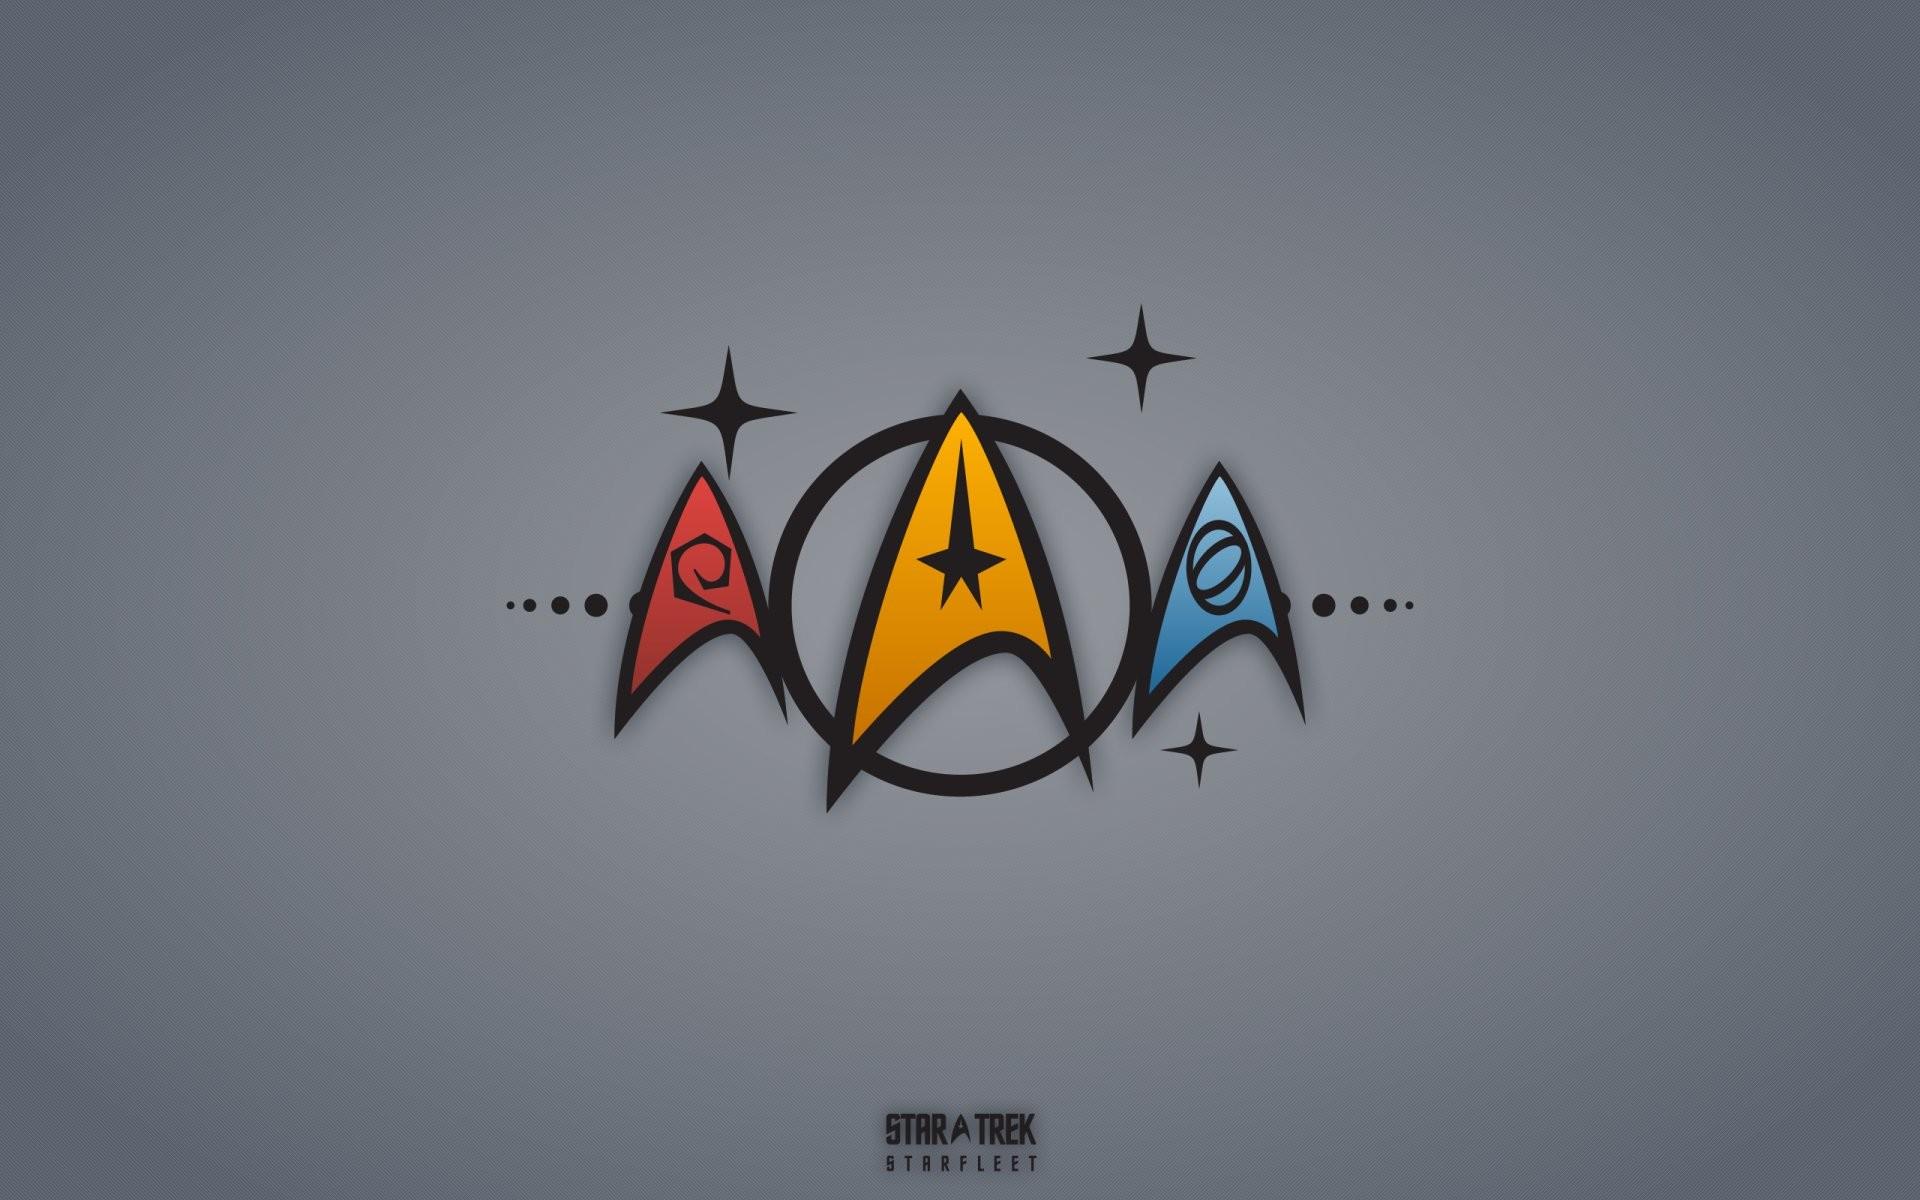 … star trek symbols wallpapers simply wallpaper just …